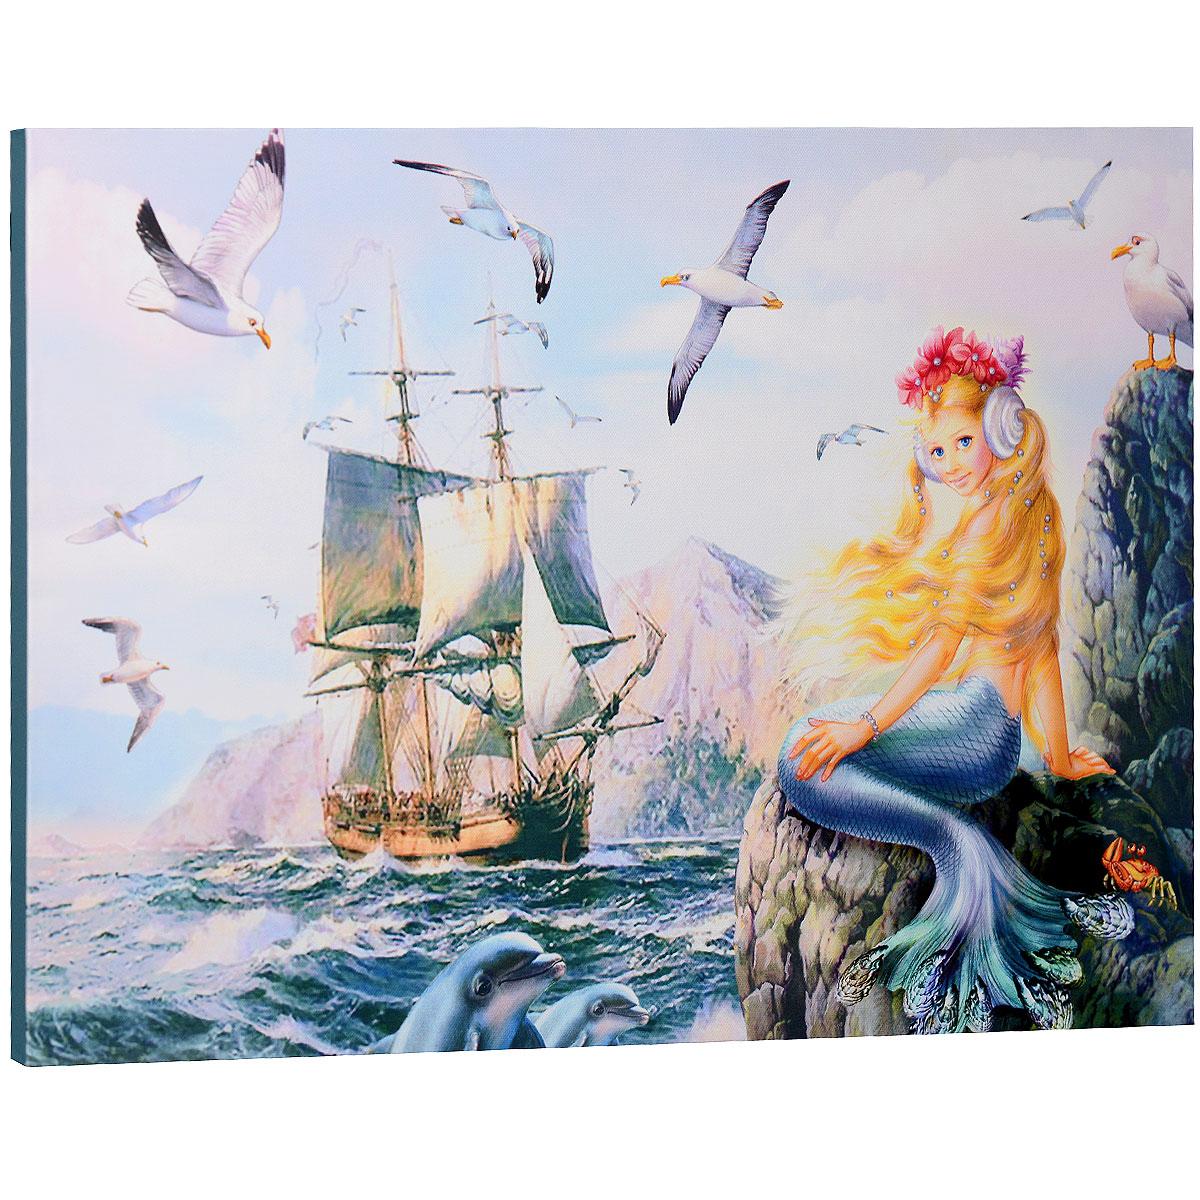 КвикДекор Картина на холсте  Морская принцесса , 60 см х 40 см -  Детская комната